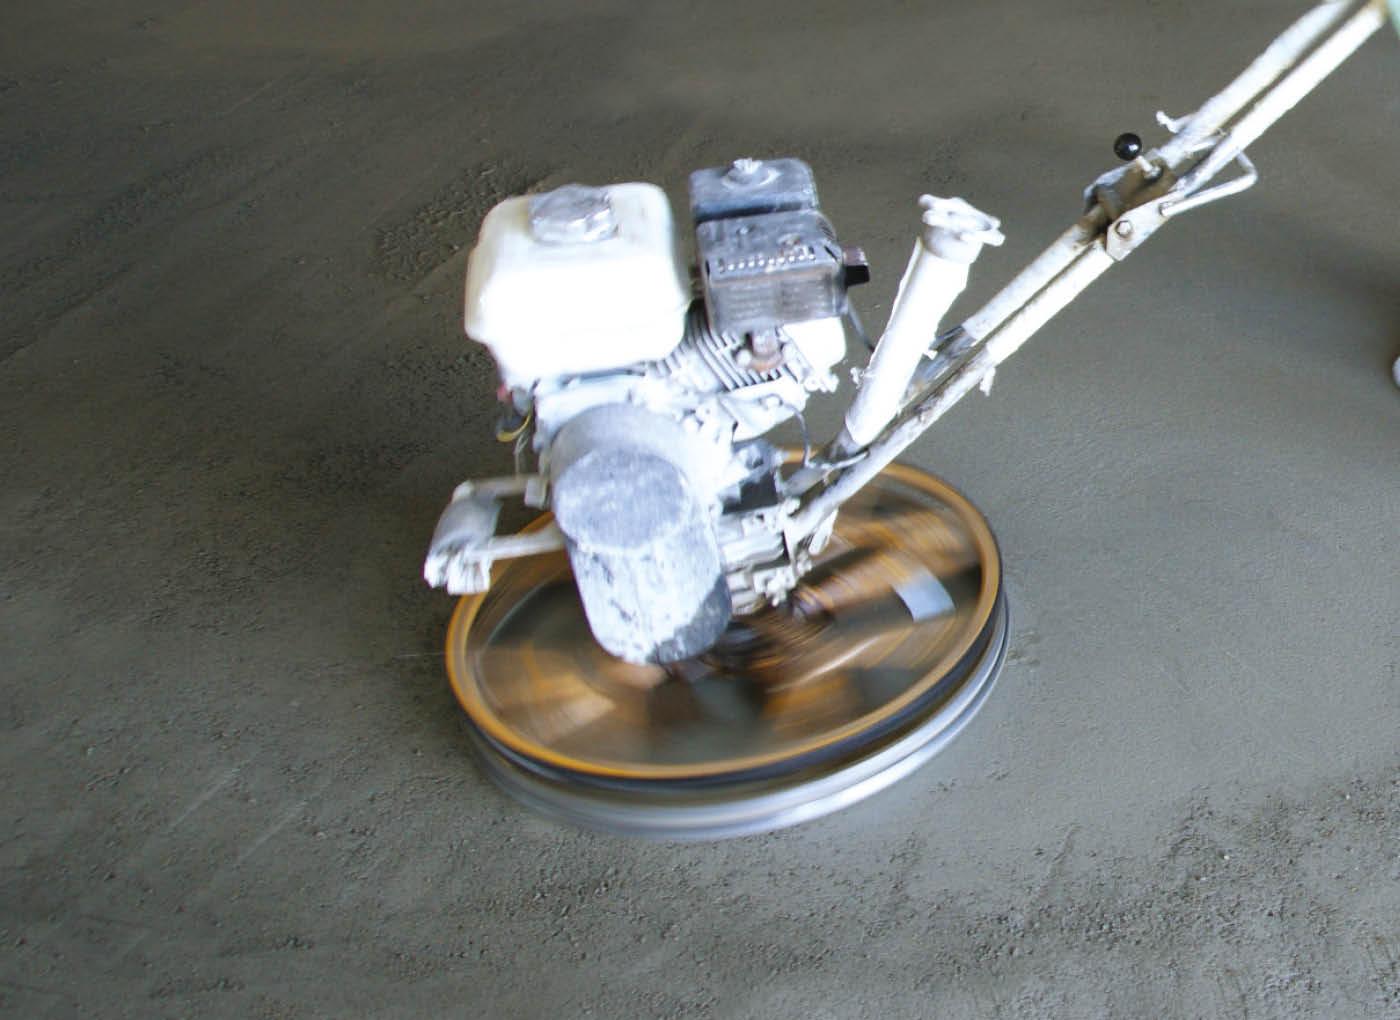 frattazzatura-meccanica-lecamix-P14-15